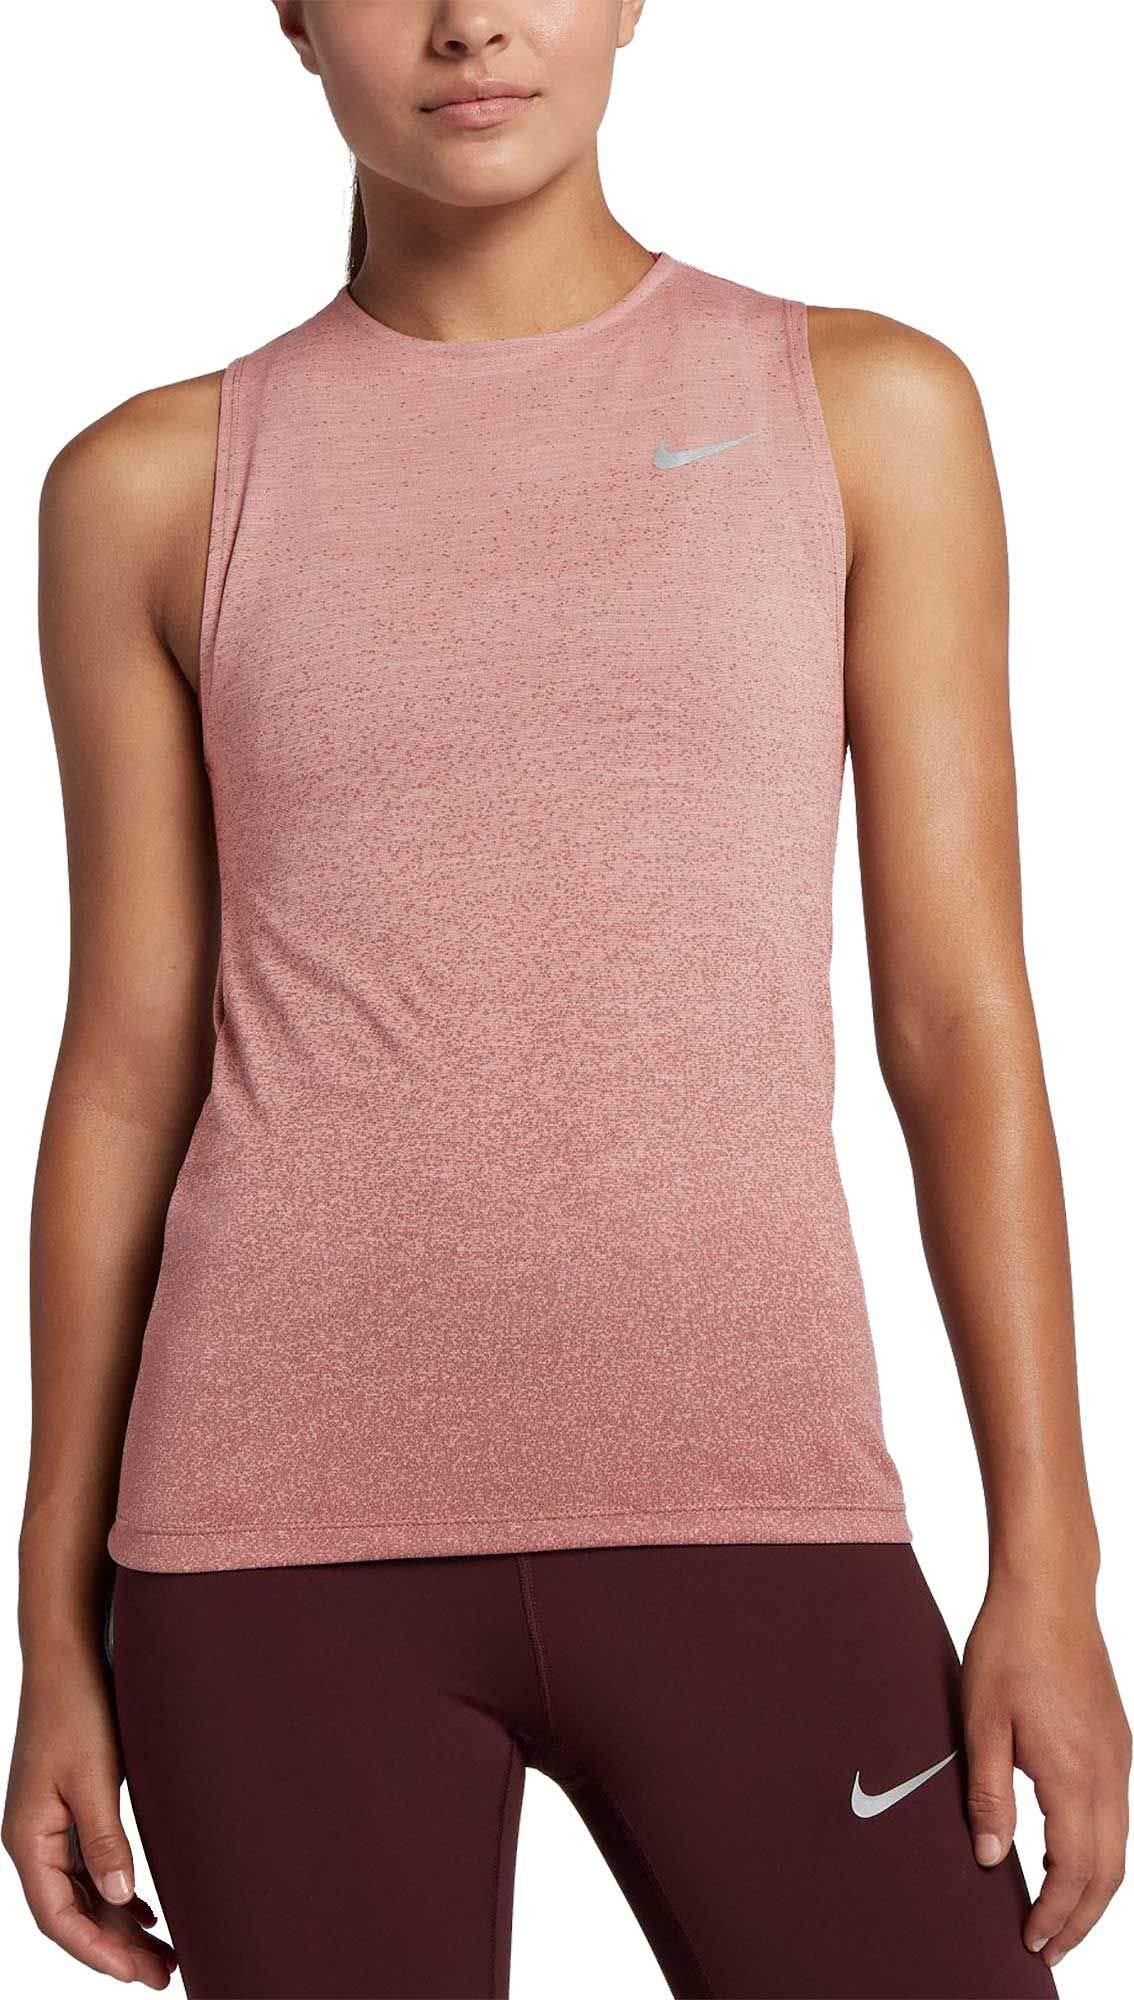 Nike Women's Medalist Running Tank Top (Storm Pink/Smokey Mauve, X-Small)